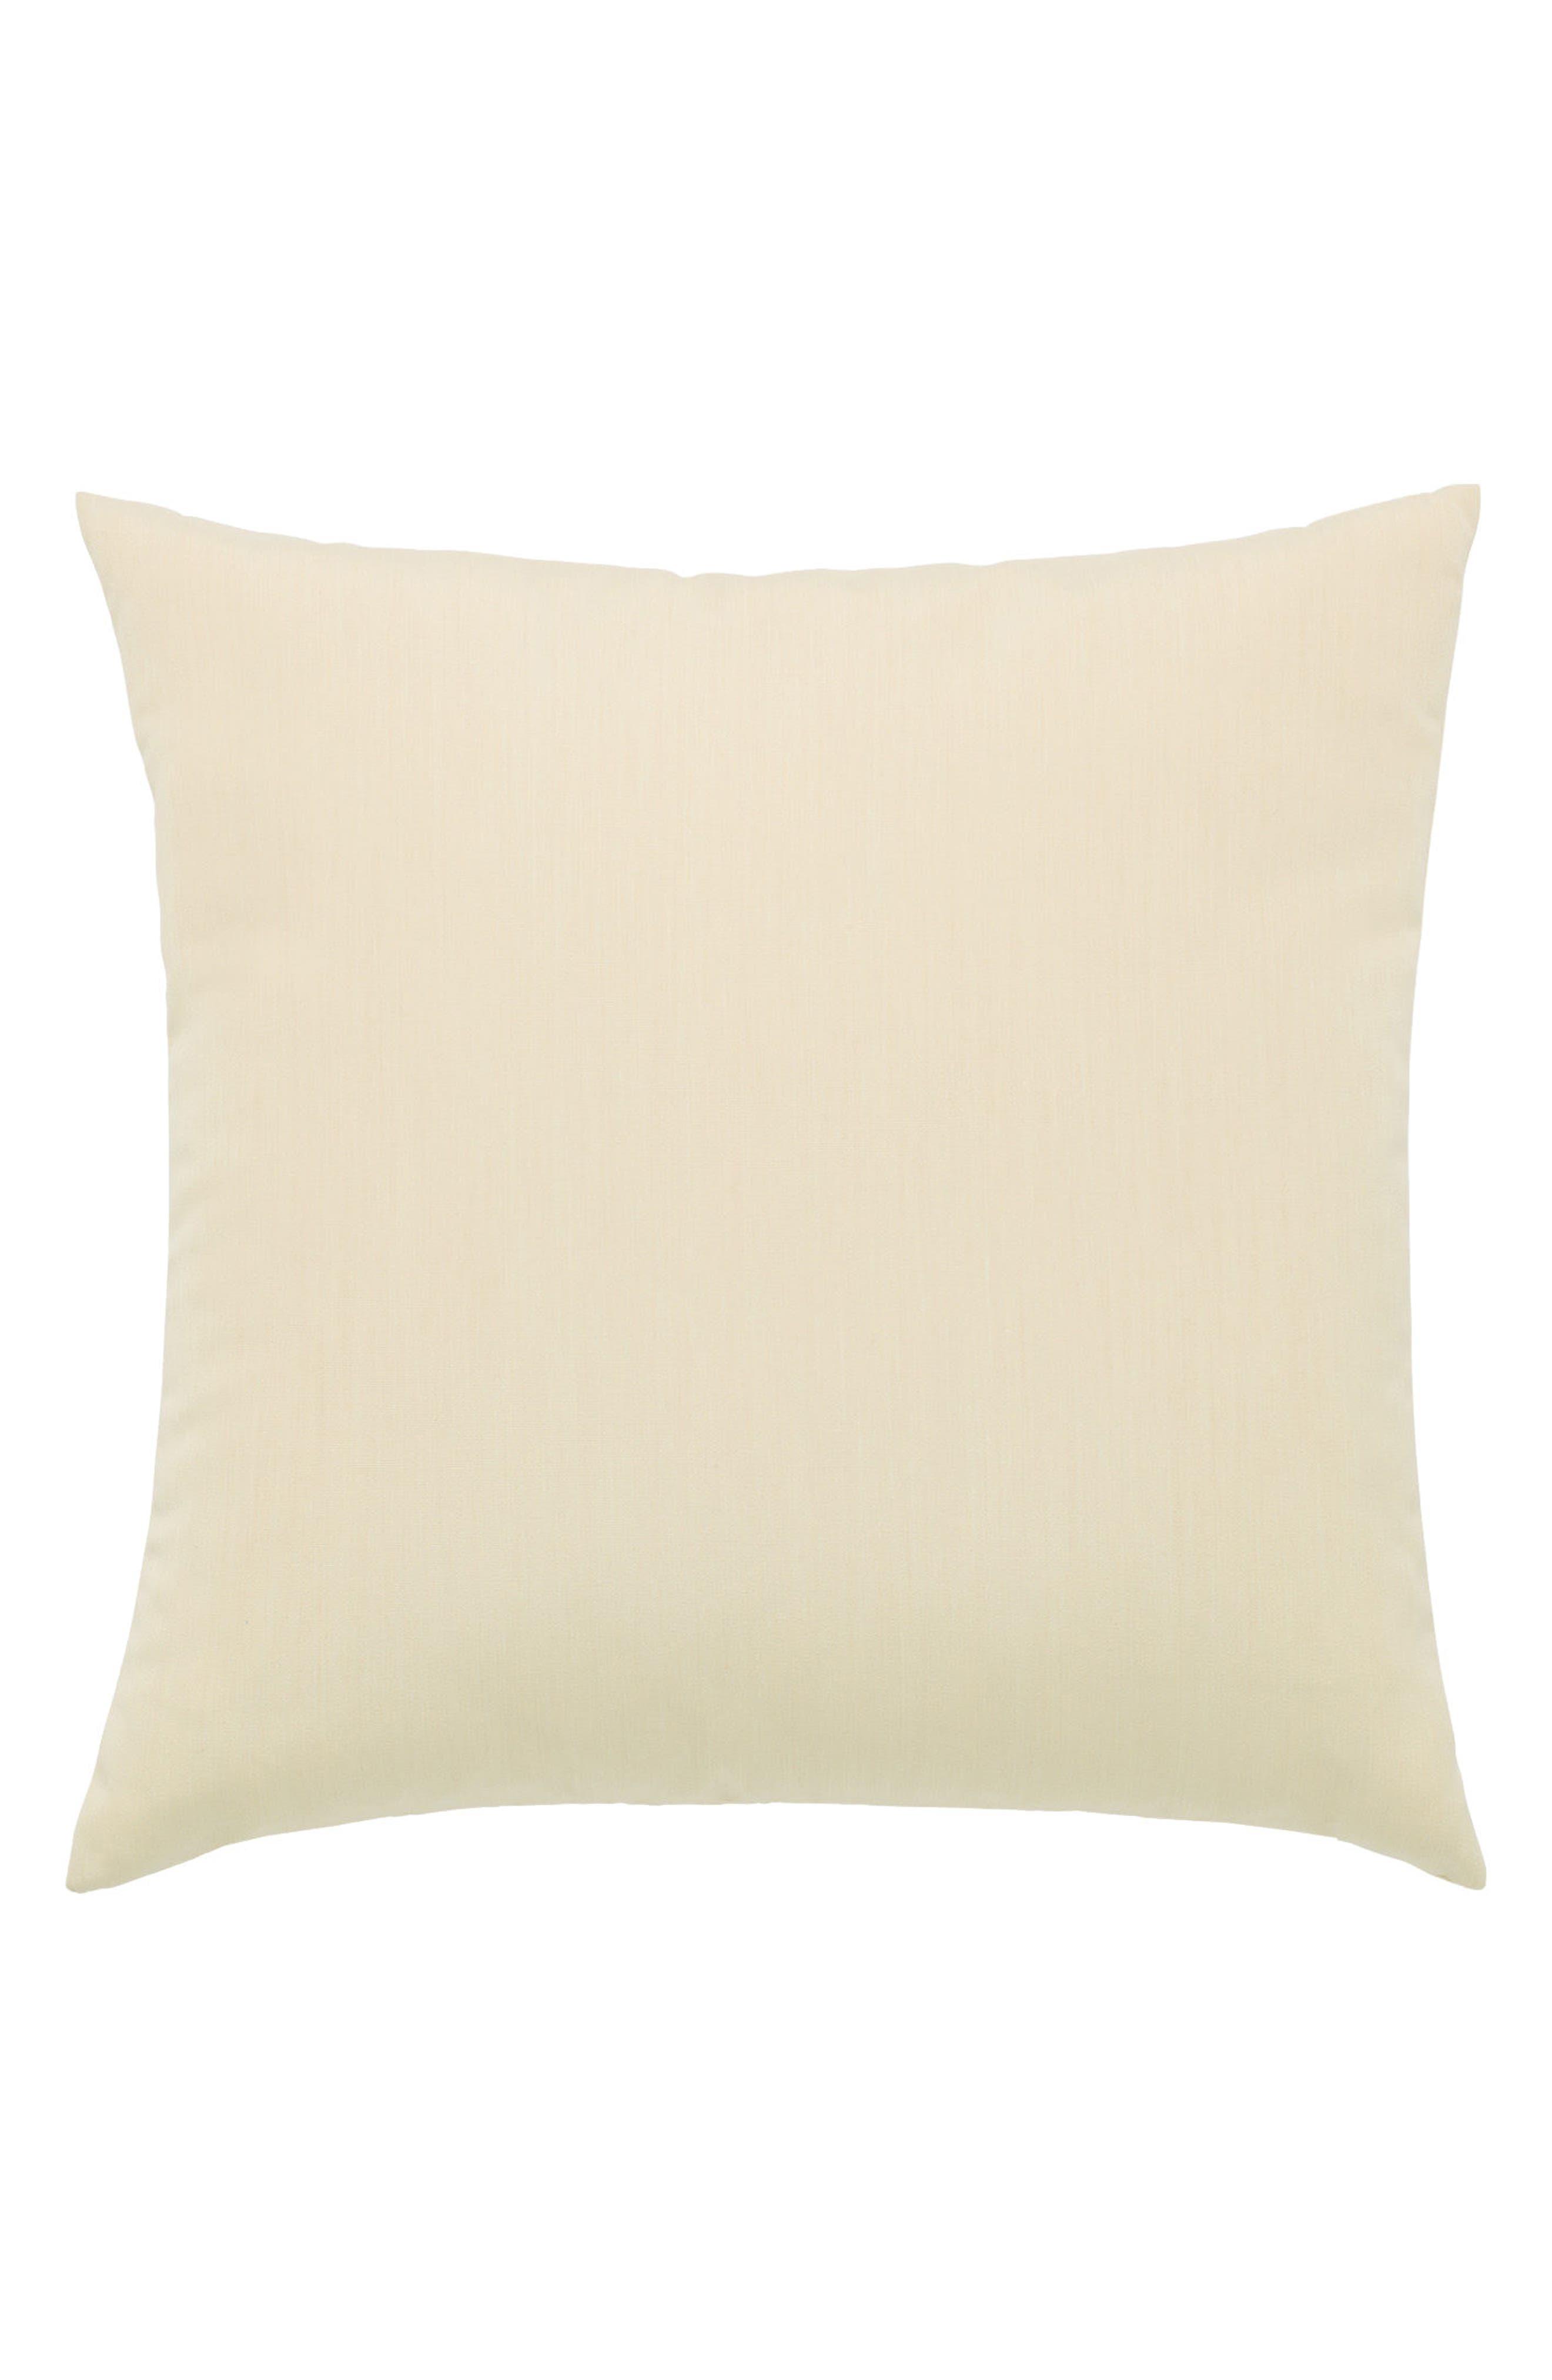 Grand Turk Stripe Indoor/Outdoor Accent Pillow,                             Alternate thumbnail 2, color,                             Blue/ Orange